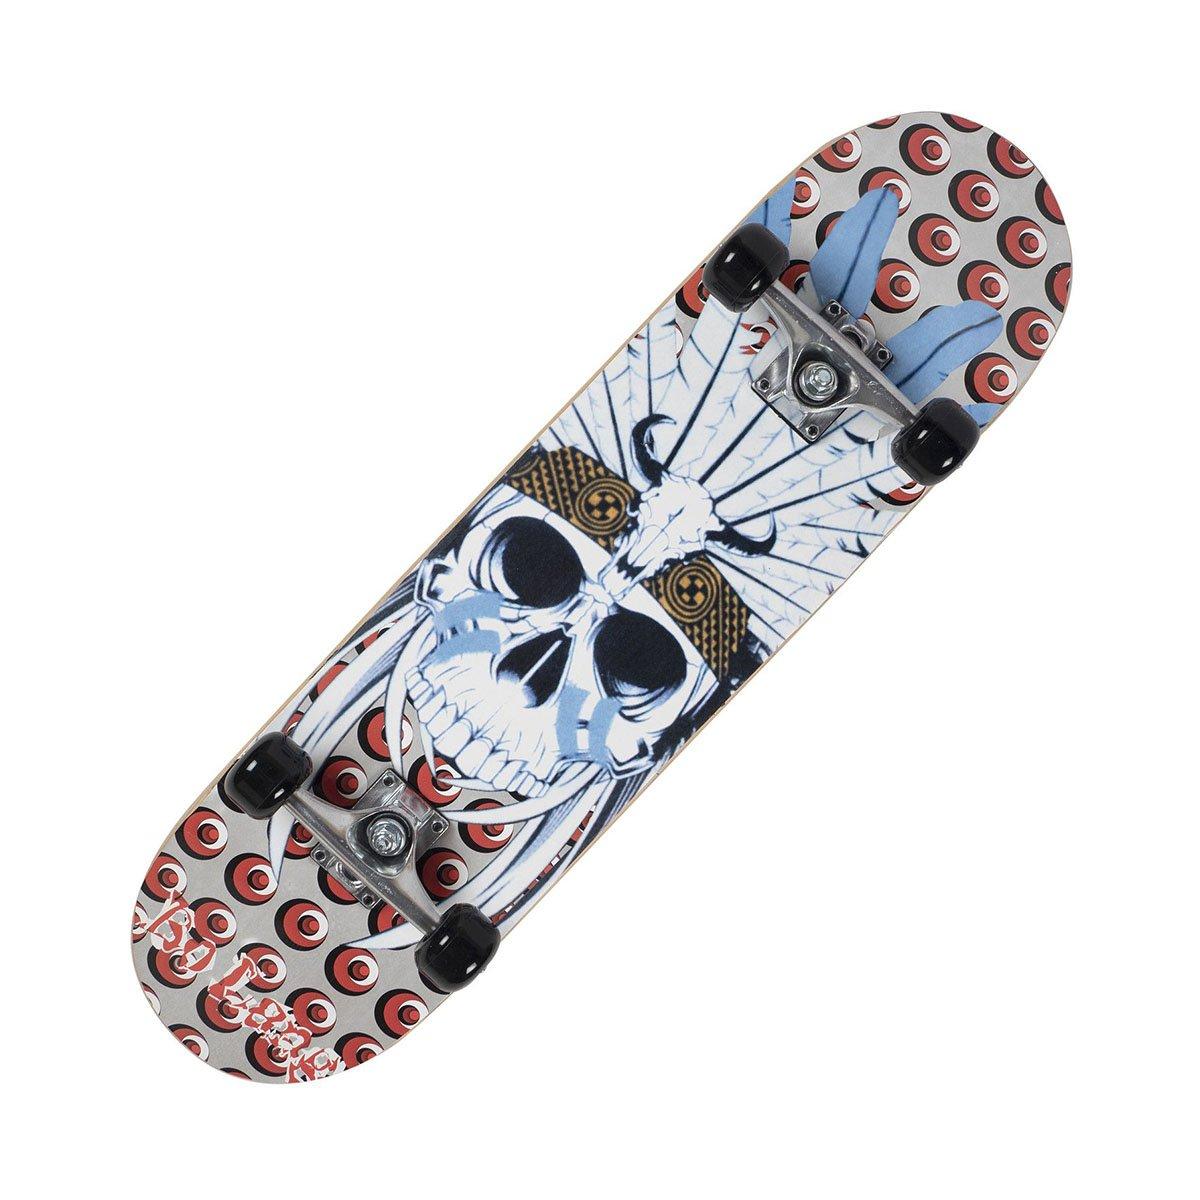 Skateboard Action One, 80 cm, Shaman